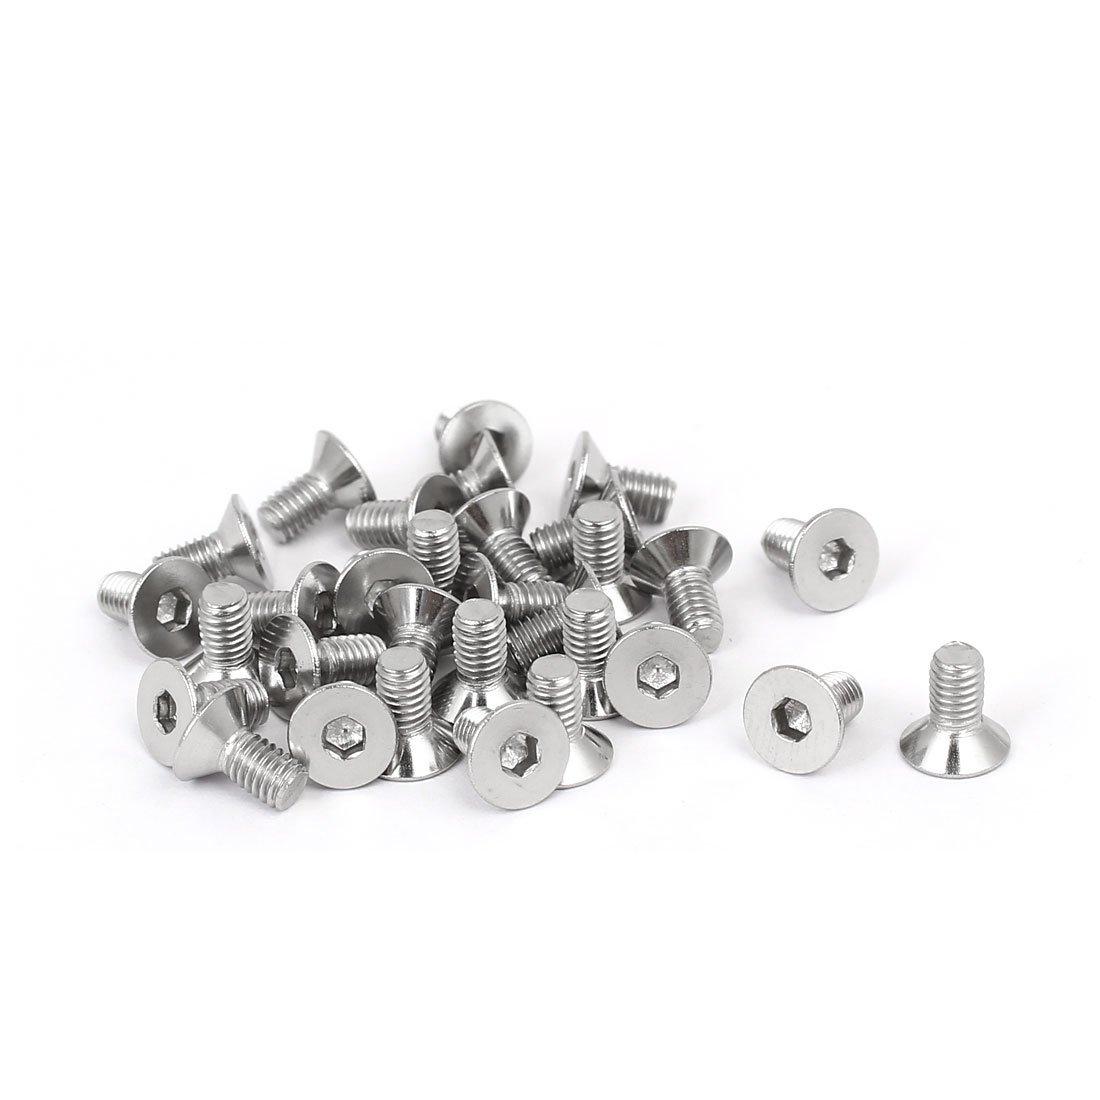 uxcell DIN7991 M3x6mm 316 Stainless Steel Flat Head Hex Socket Cap Screw Bolt 30pcs a16090700ux1213